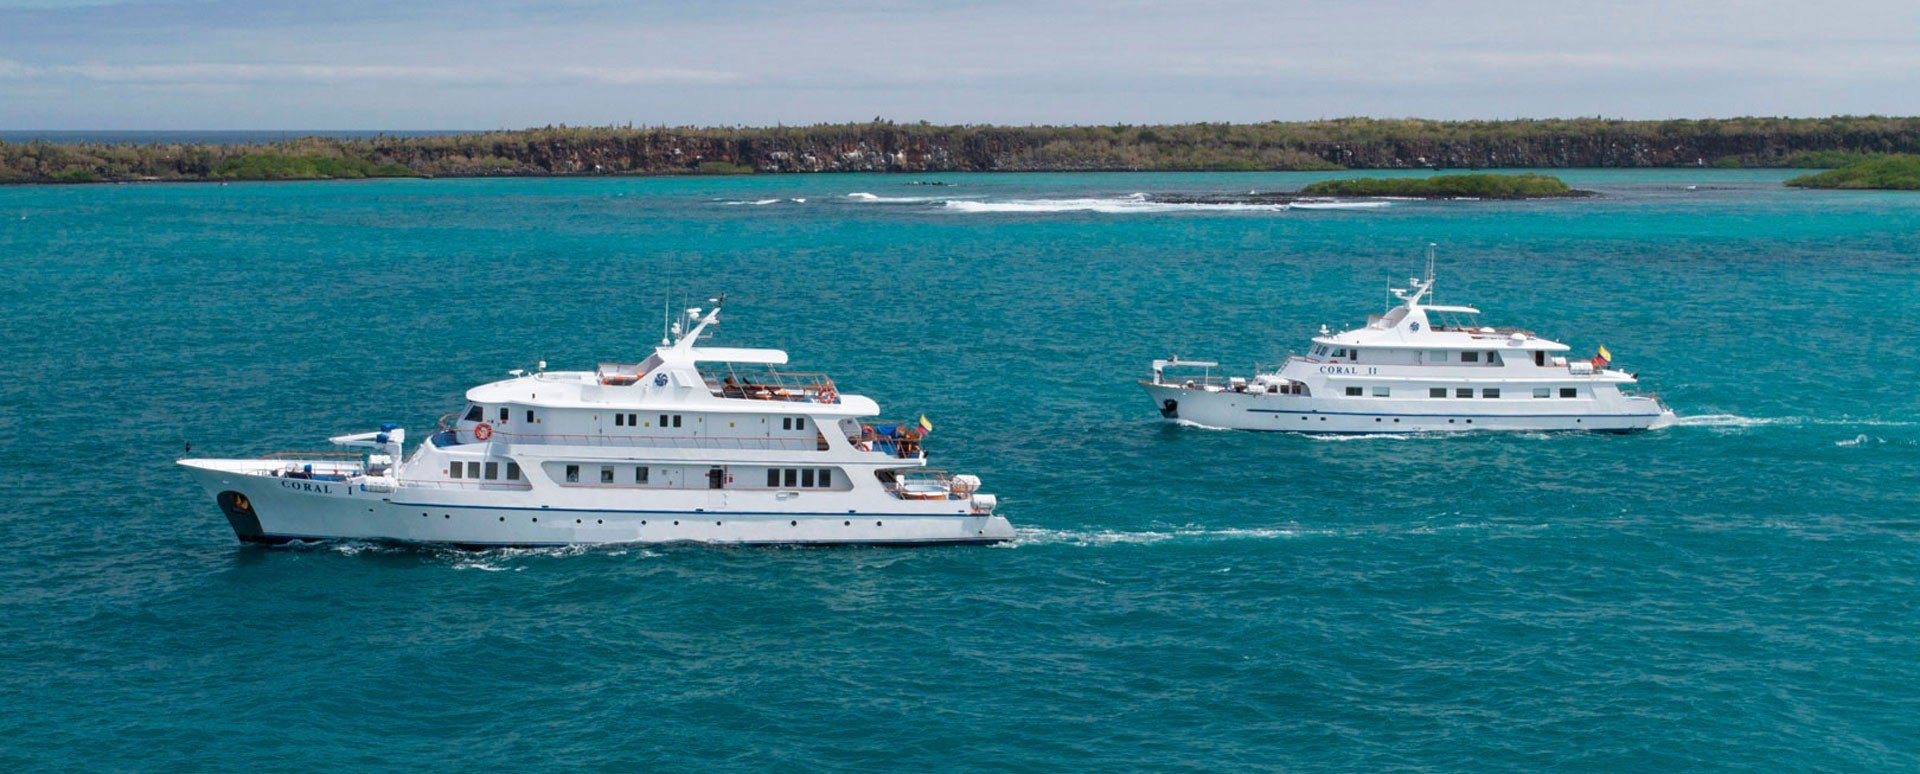 Galapagos Coral I & II Yachts